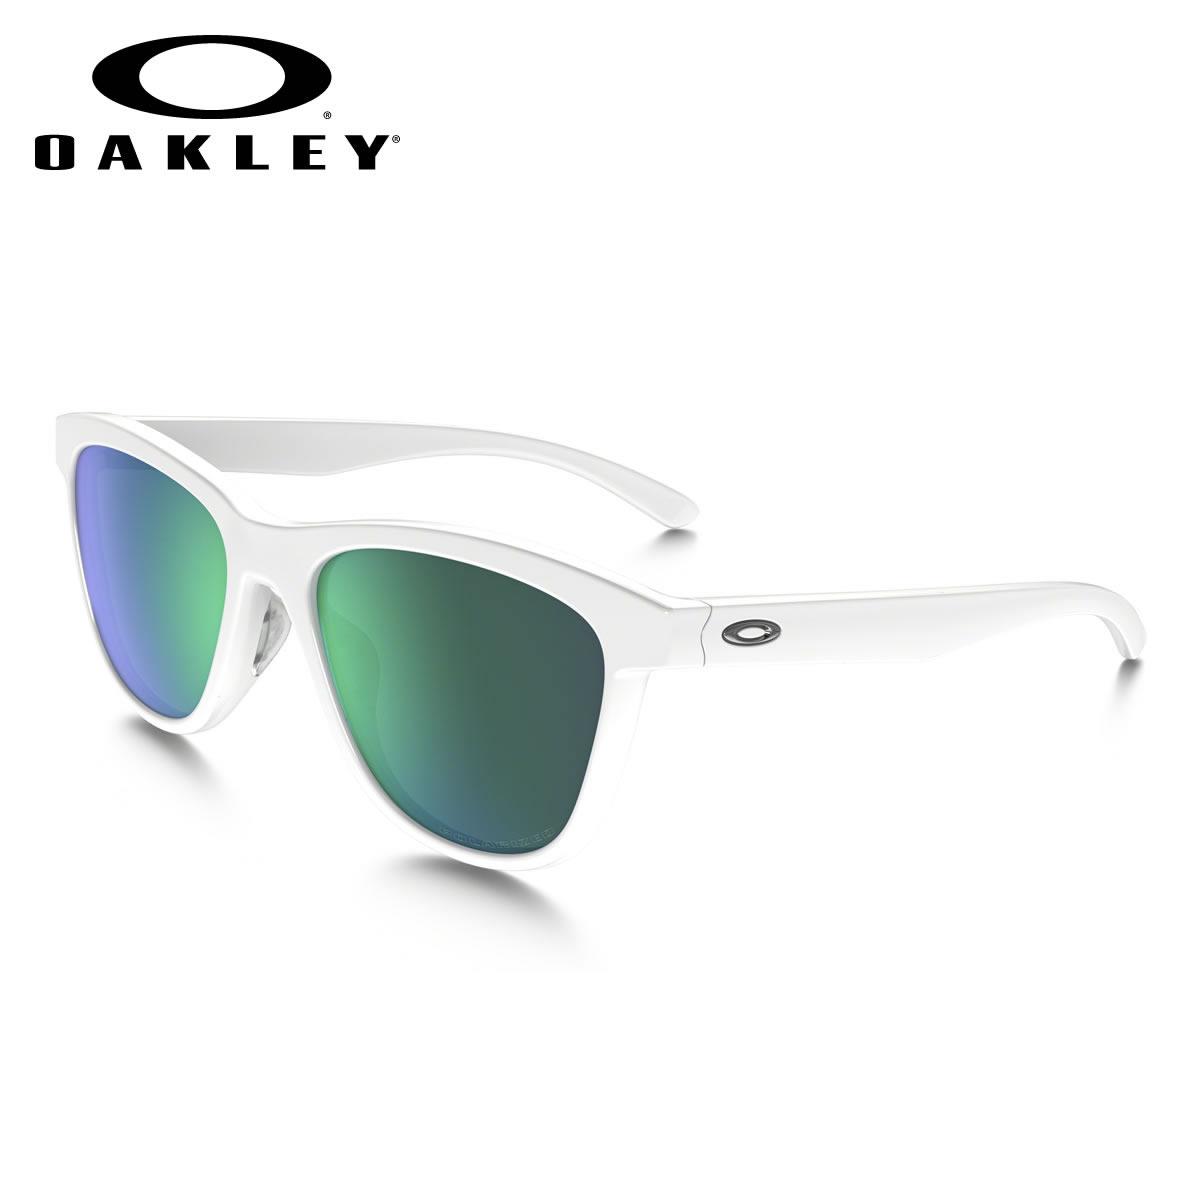 3d23af32a91 -OAKLEY sunglasses OO9320-06 MOONLIGHTER Moon writer casual OAKLEY men s  ladies